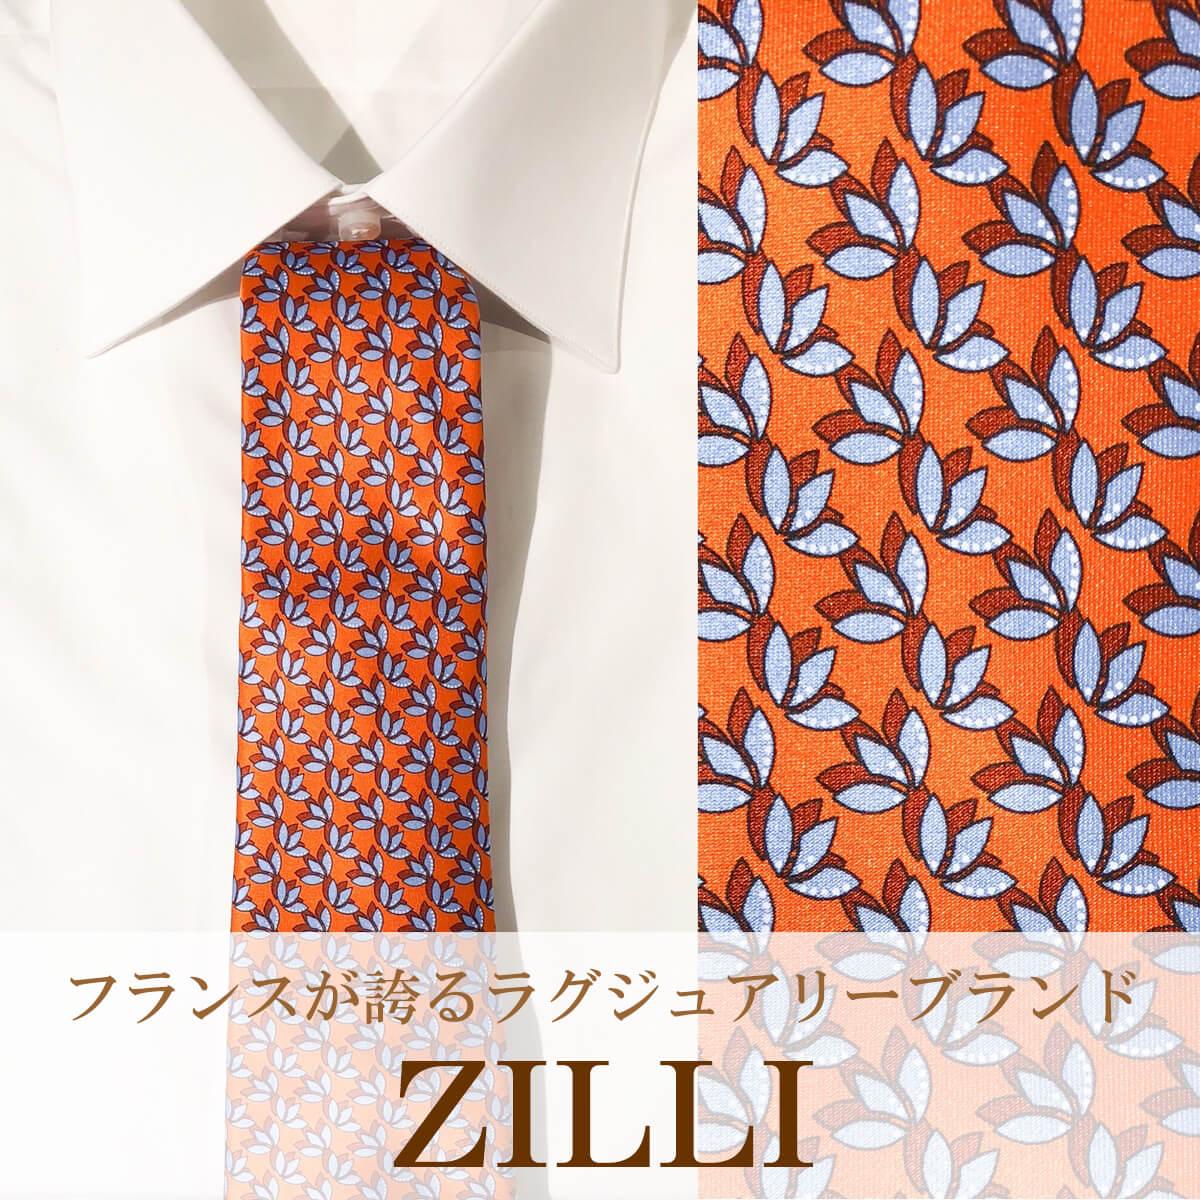 ZILLI (ジリー)ネクタイ ブランド ジリー ZILLI プリント 細身 セブンフォールド メンズ 結婚式 パーティー おしゃれ